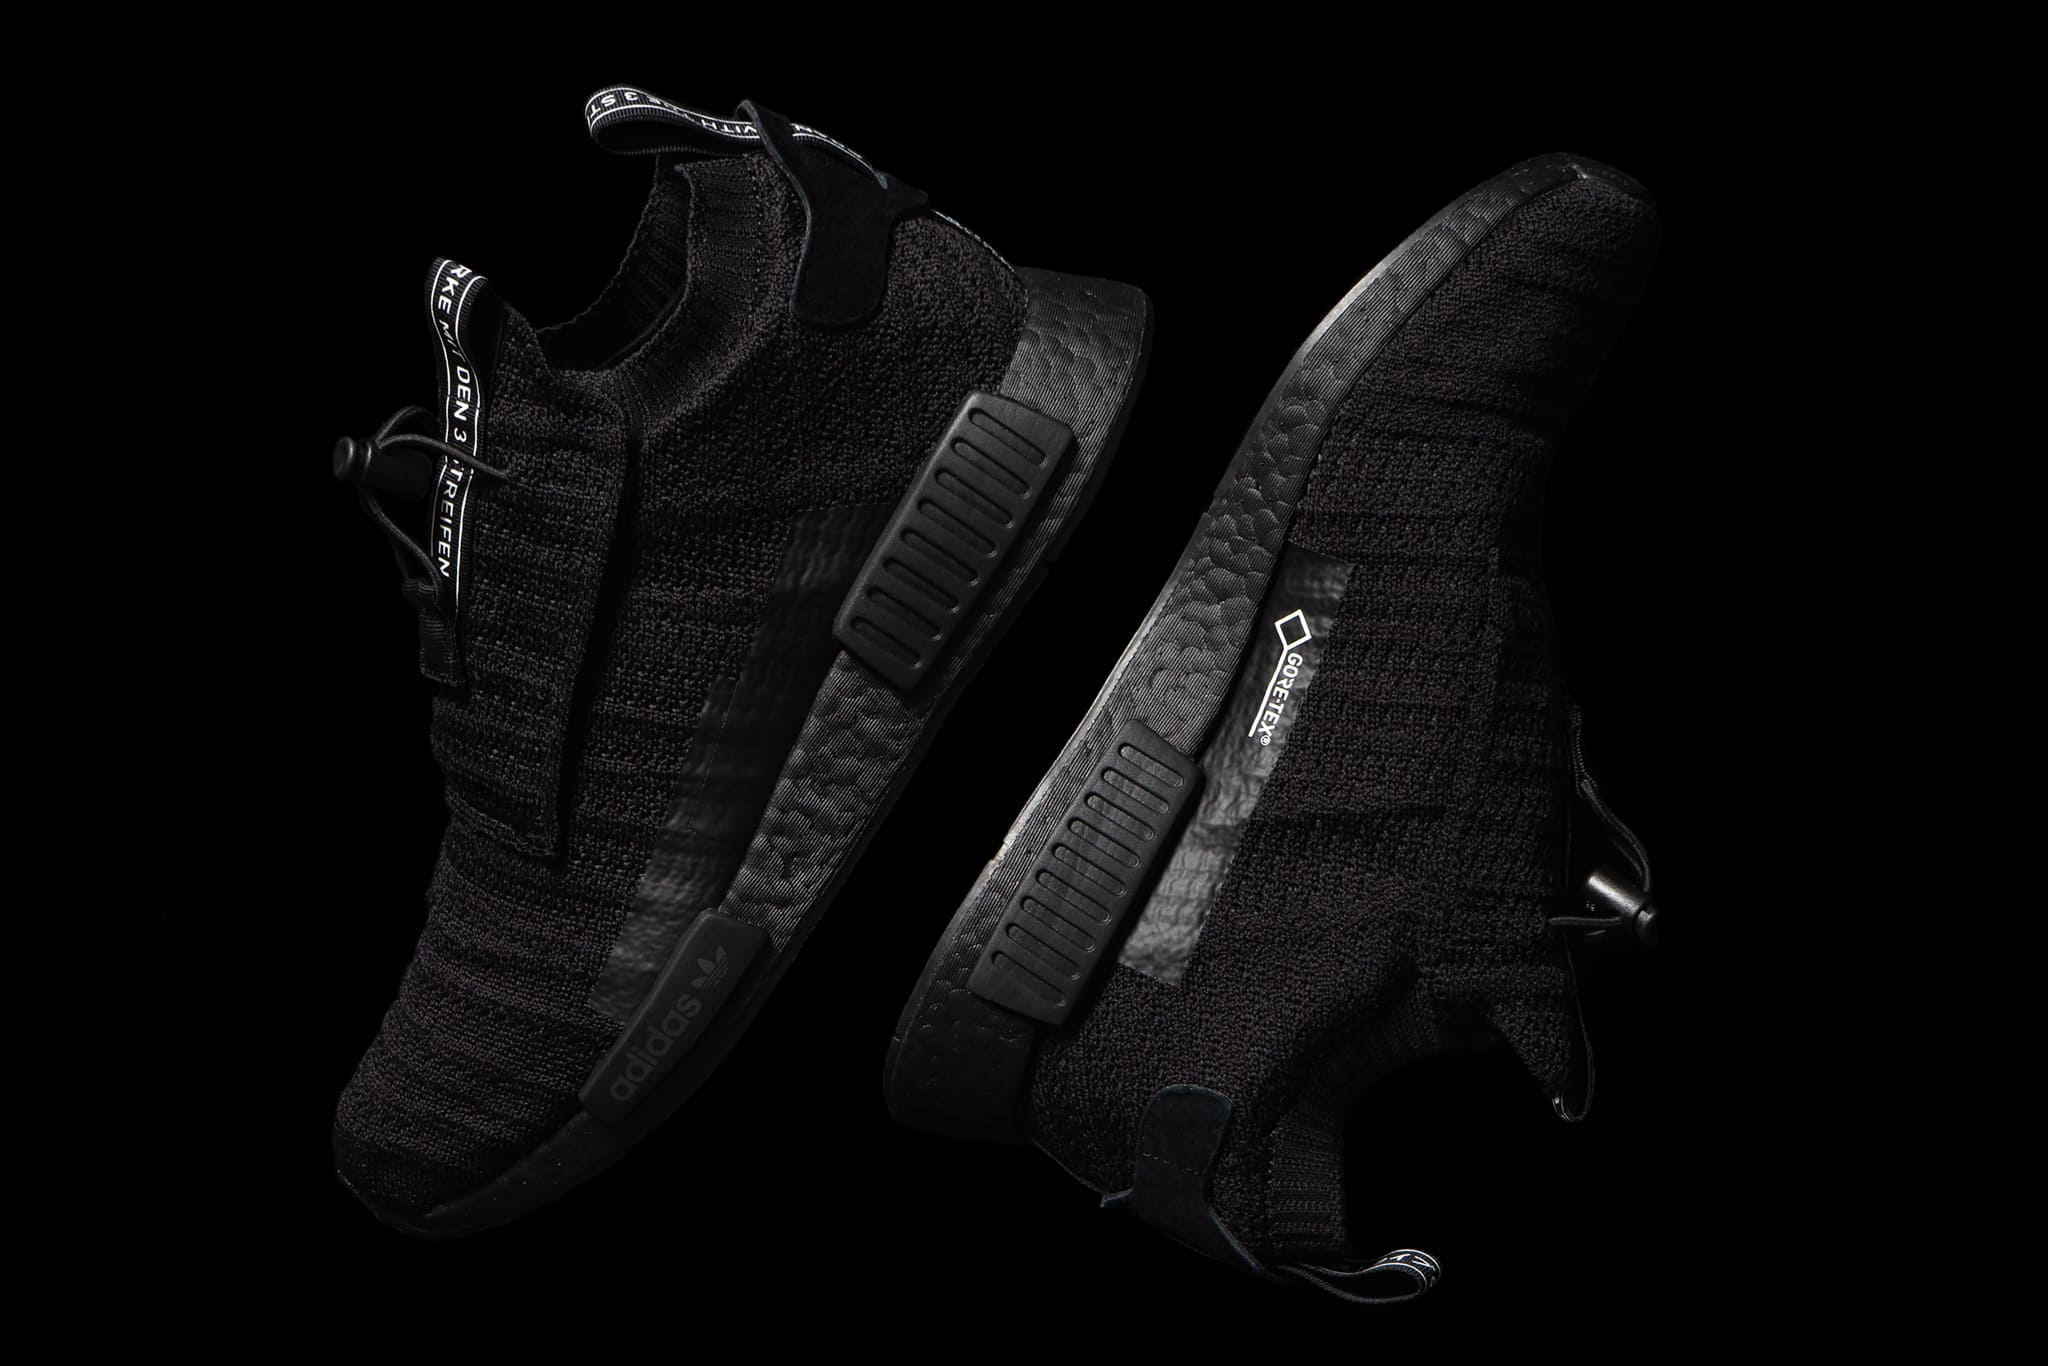 084f610d7 adidas-NMD-TS1-PK-GTX-BLACK-Web-News-1 gkwytm.jpg